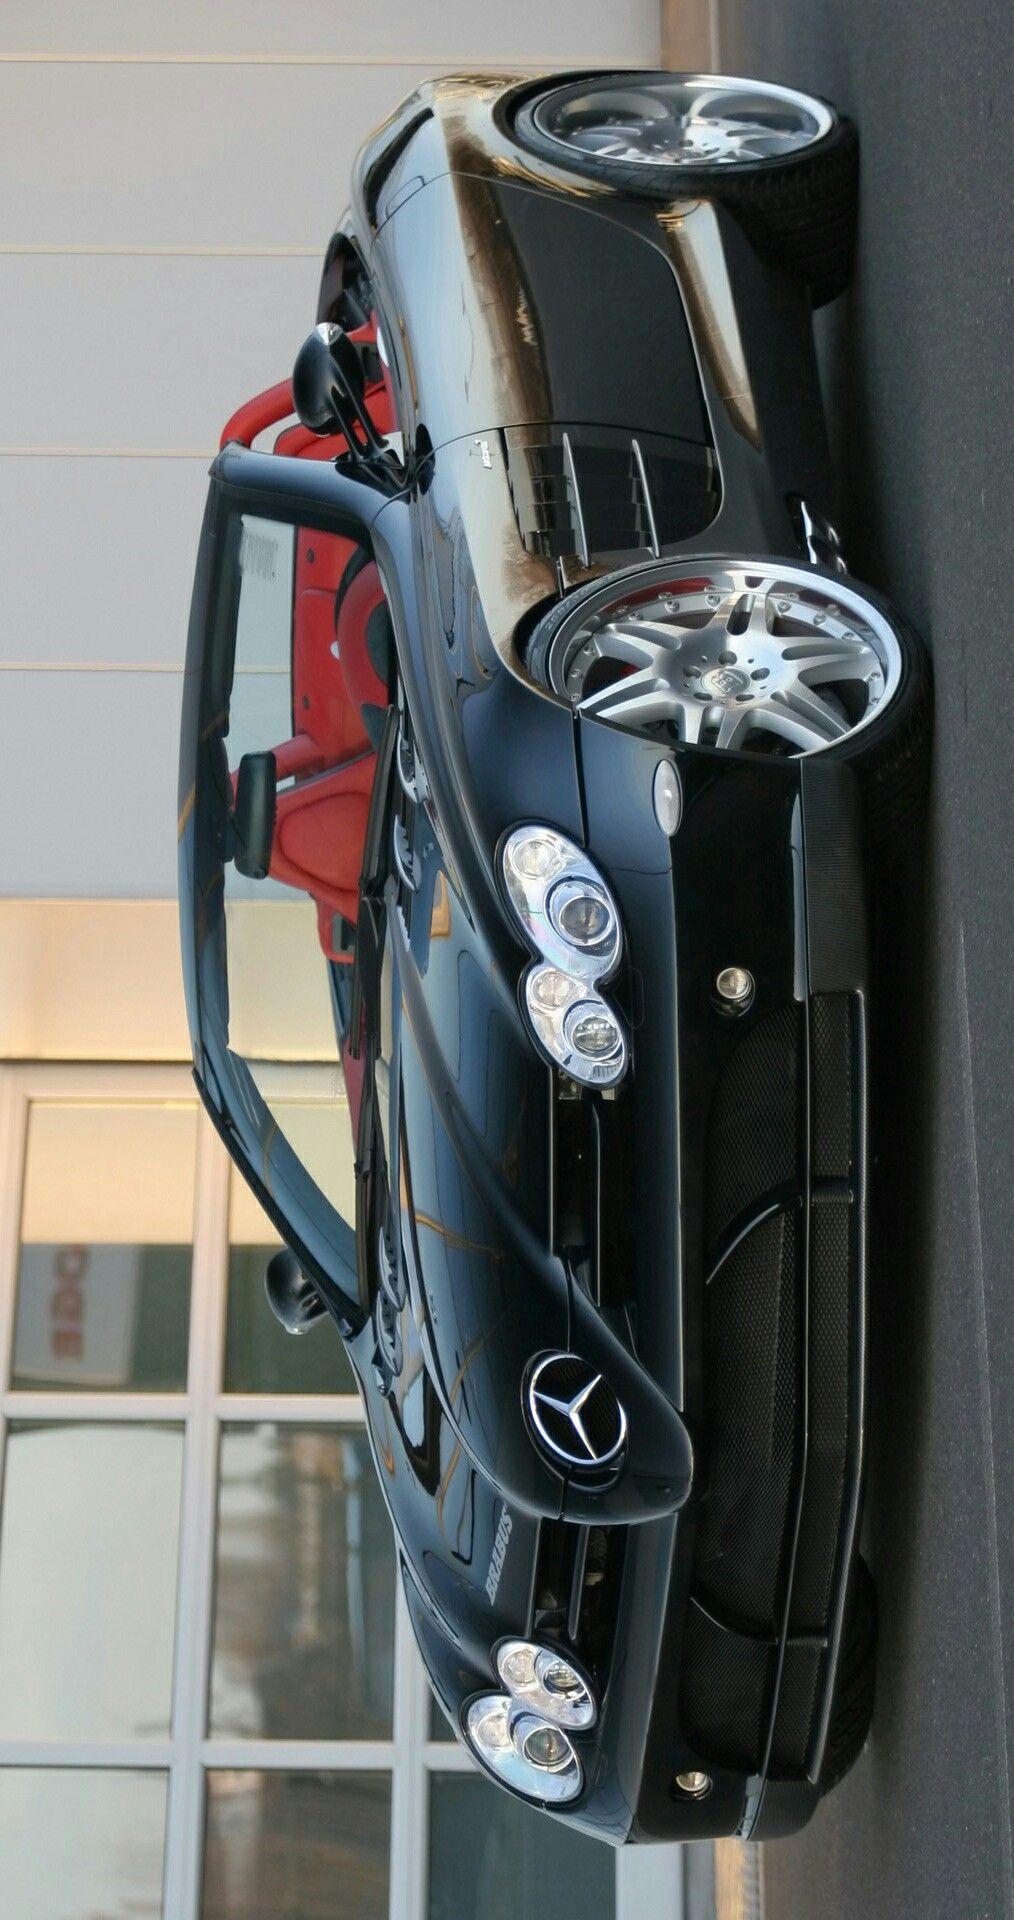 2008 Brabus Mercedes Benz McLaren SLR Roadster